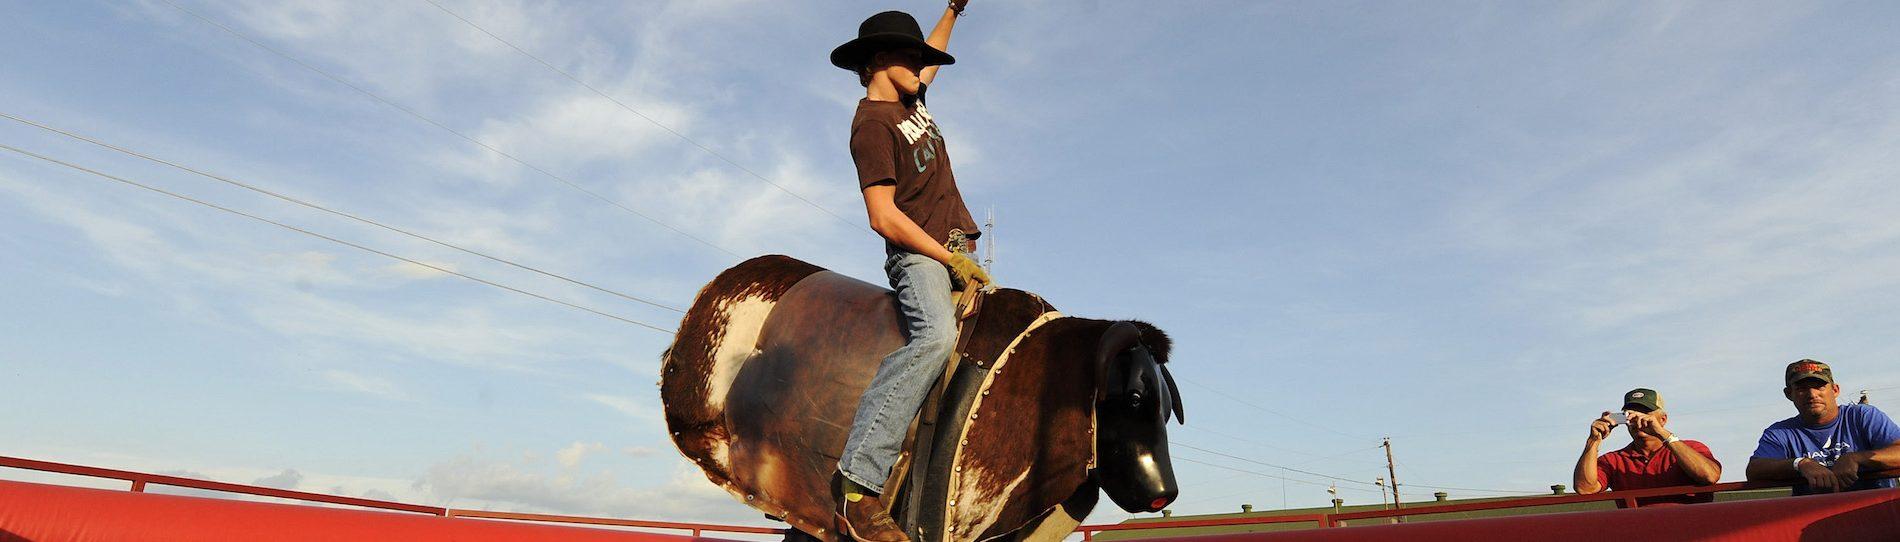 buck riding mechanical bull